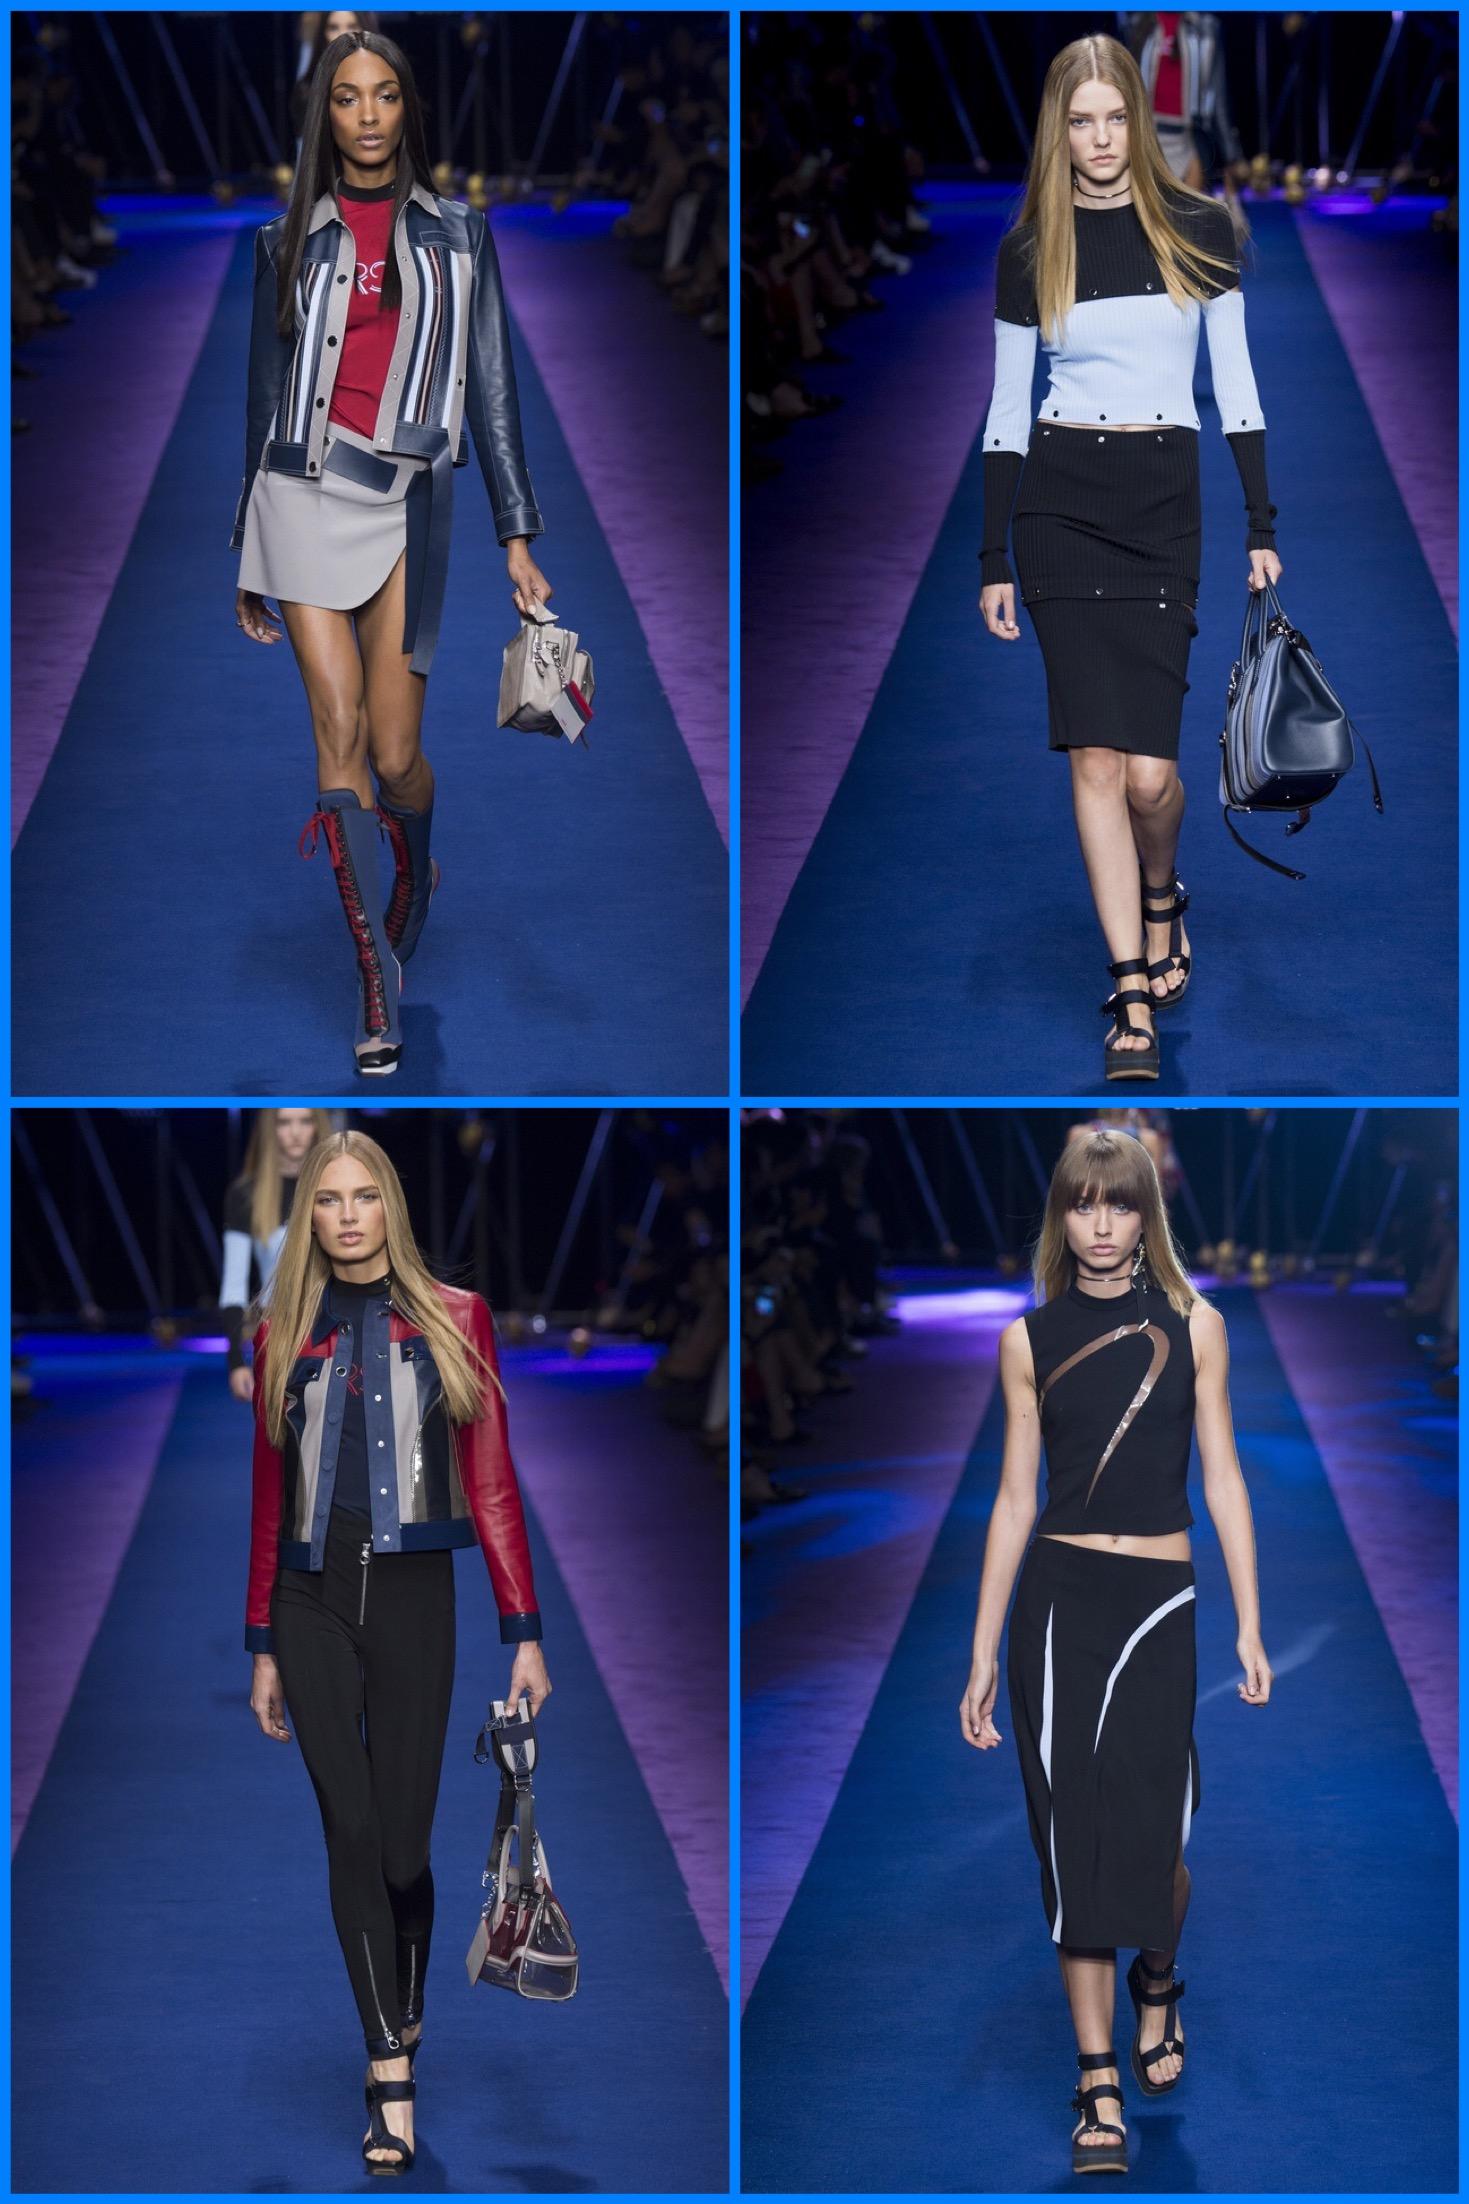 milano-fashion-week-pret-a-porter-spring-summer-2017-style-versace